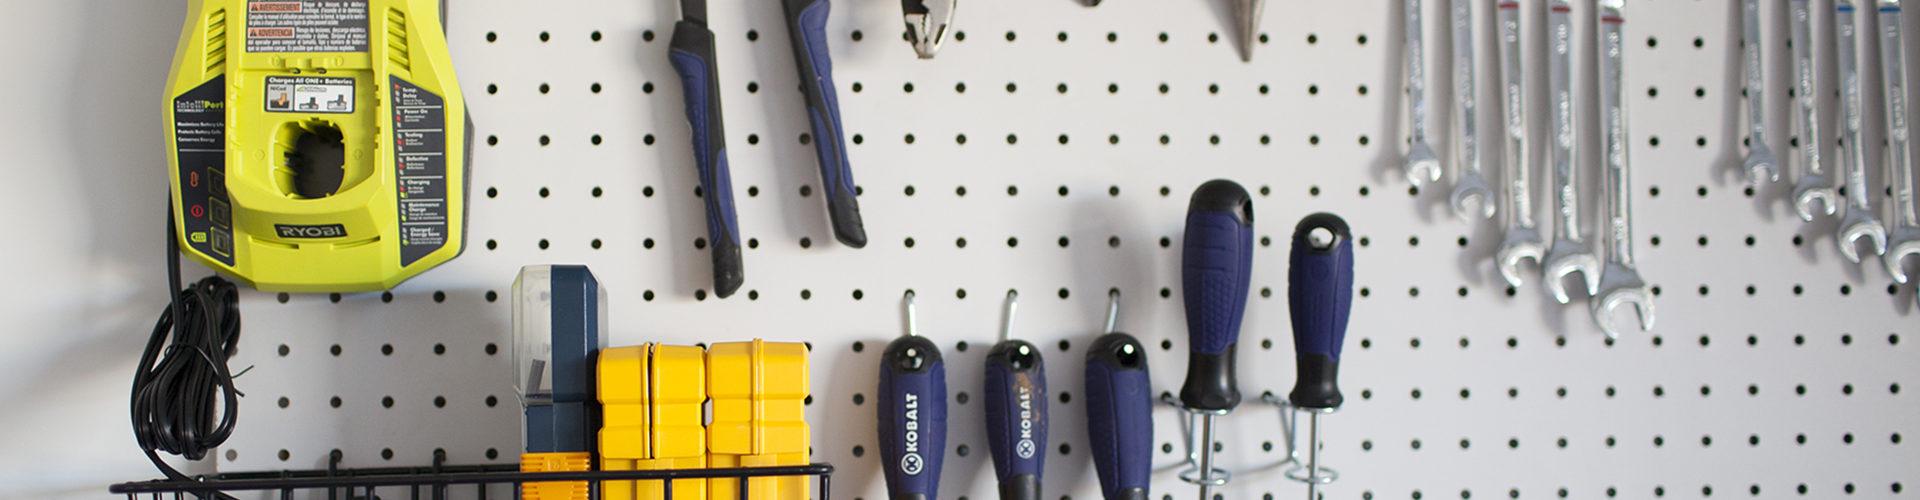 DIY garage pegboard yellow tools